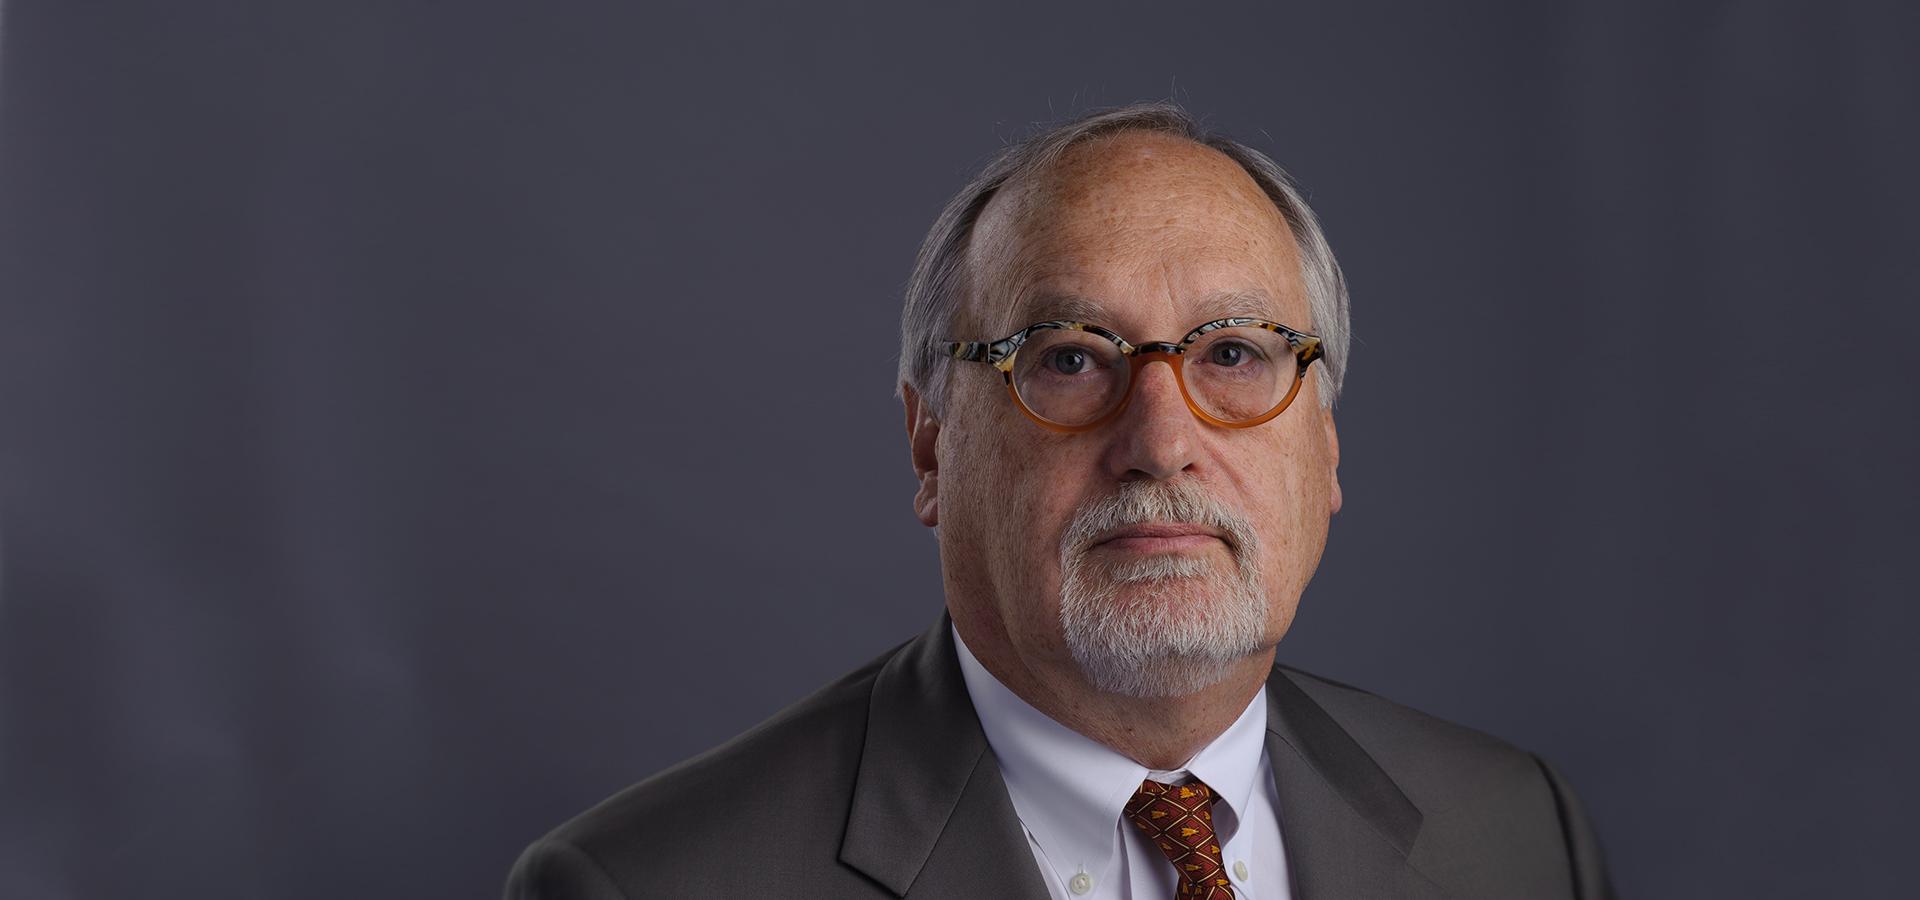 Emerson Scott, LLP Attorney John Emerson